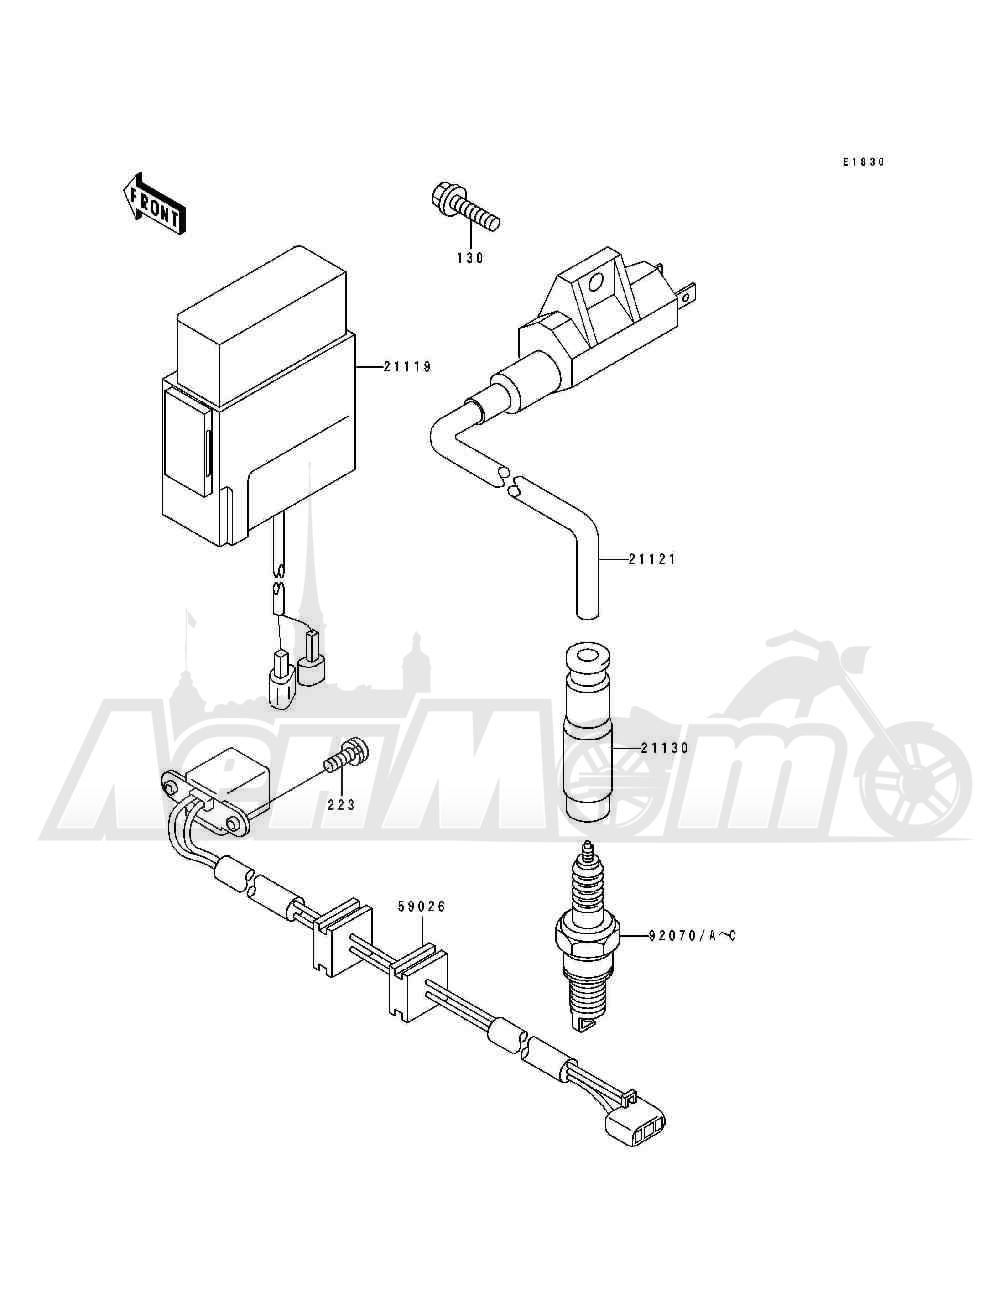 Запчасти для Квадроцикла Kawasaki 1994 BAYOU 400 4X4 (KLF400-B2) Раздел: IGNITION SYSTEM   система зажигания